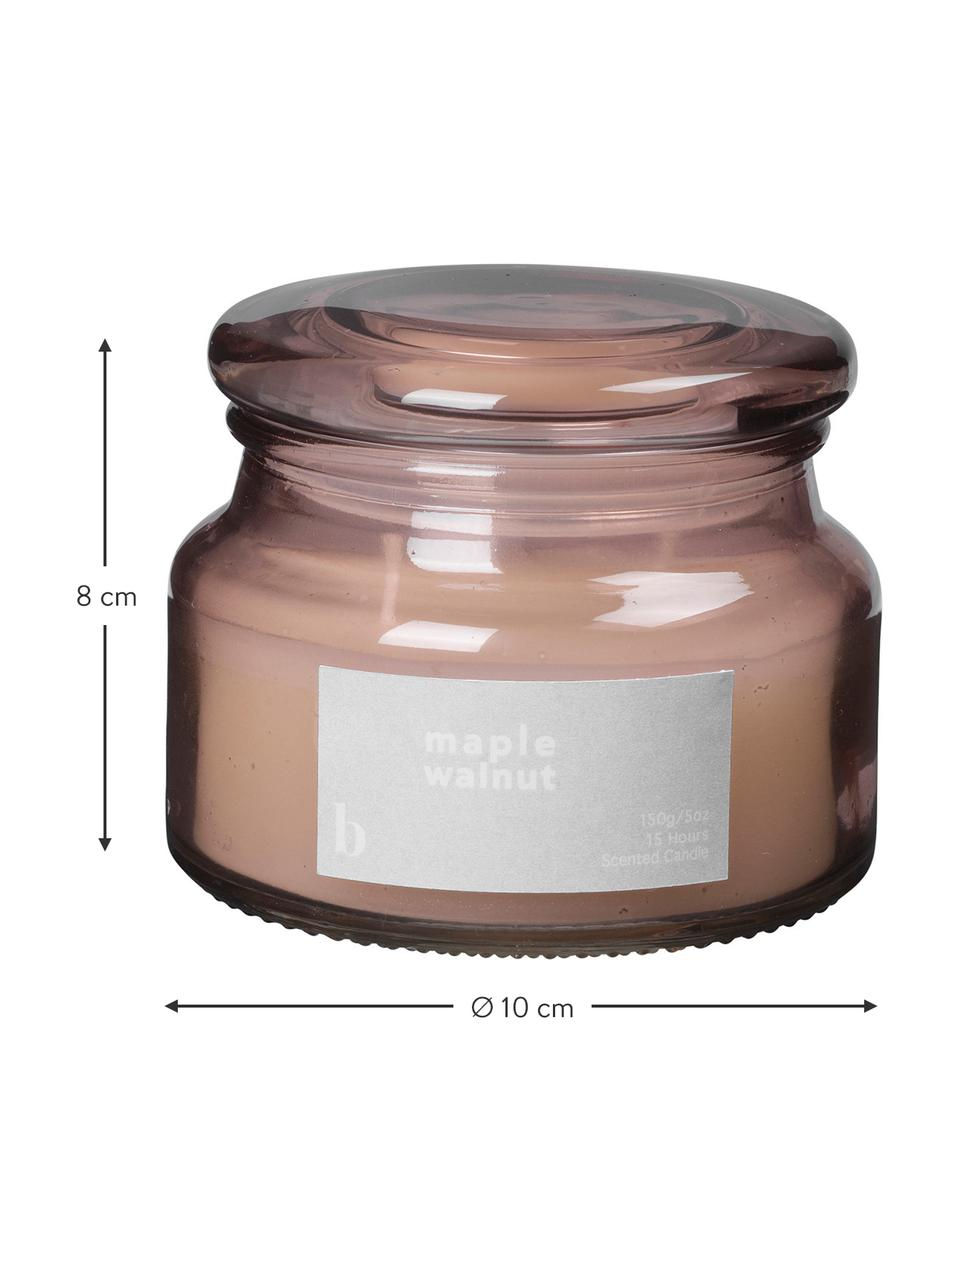 Duftkerze Maple Walnut (Walnuss), Behälter: Glas, Altrosa, Ø 10 x H 8 cm